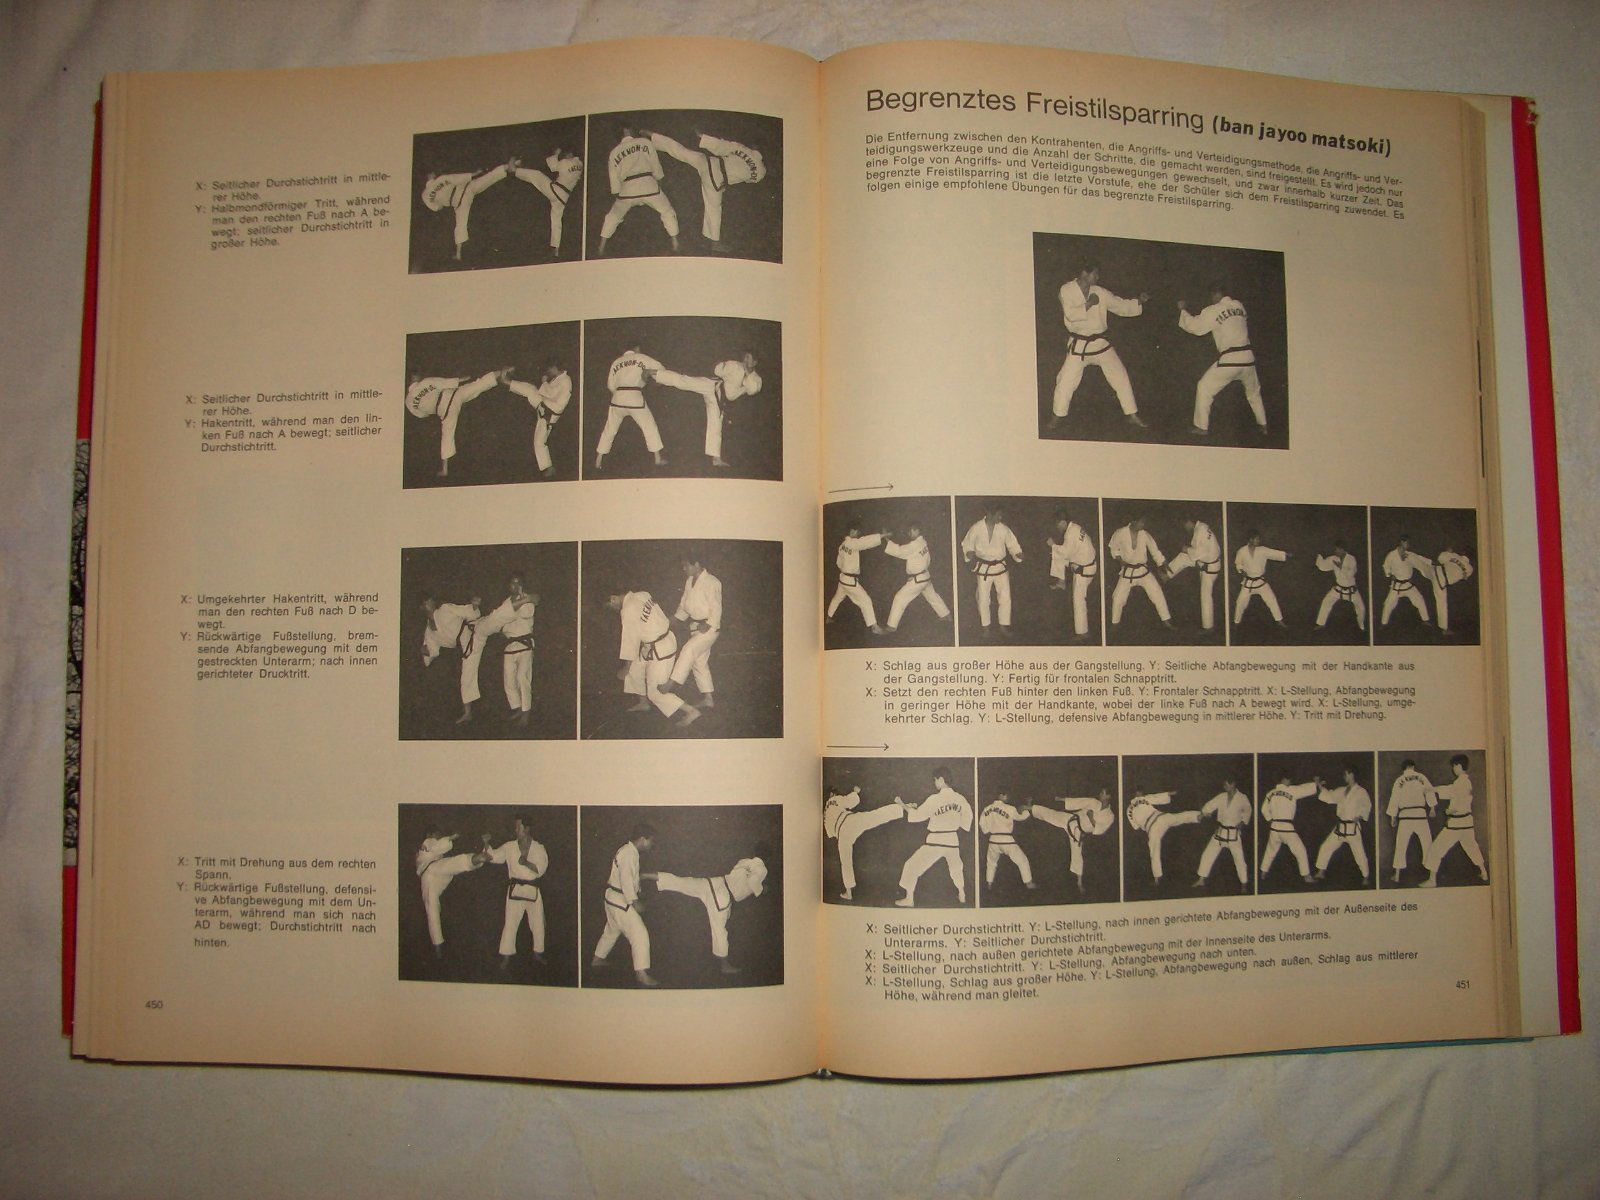 Taekwon Do. Der Koreanische Weg Der Selbstverteidigung: Amazon.de: Choi  Hong Hi: Bücher